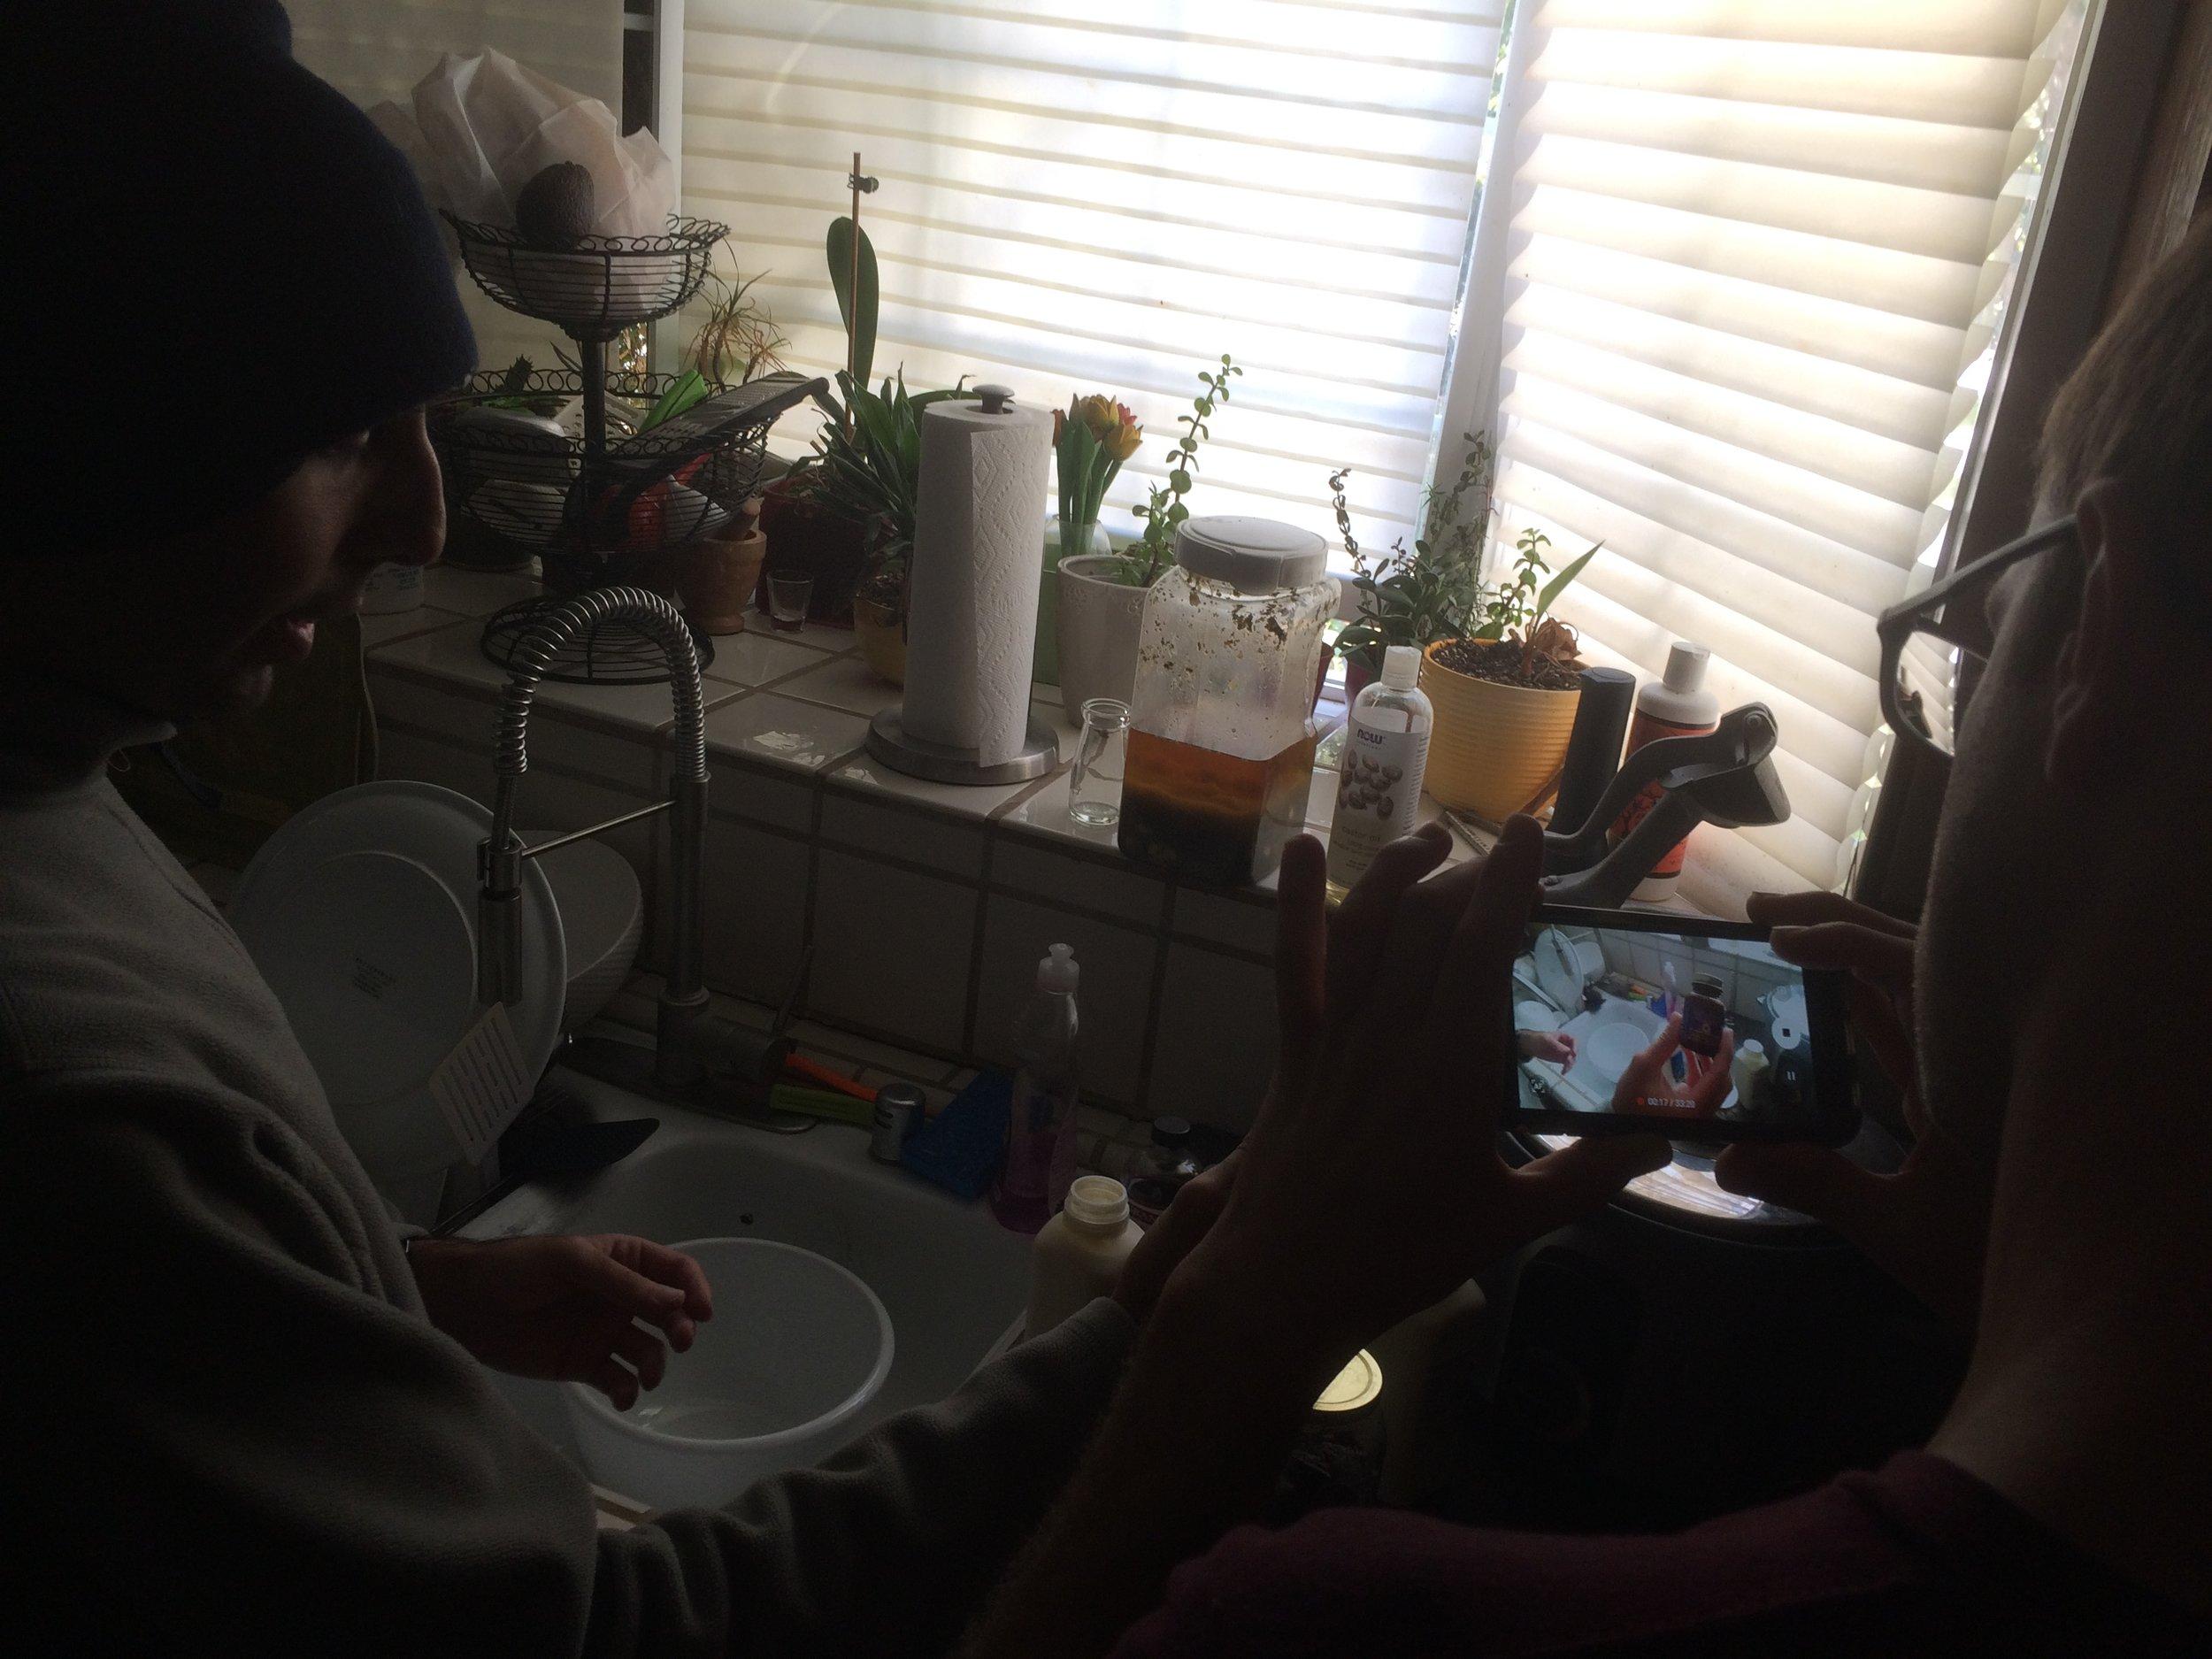 Nari showing us how to make organic whipped cream.